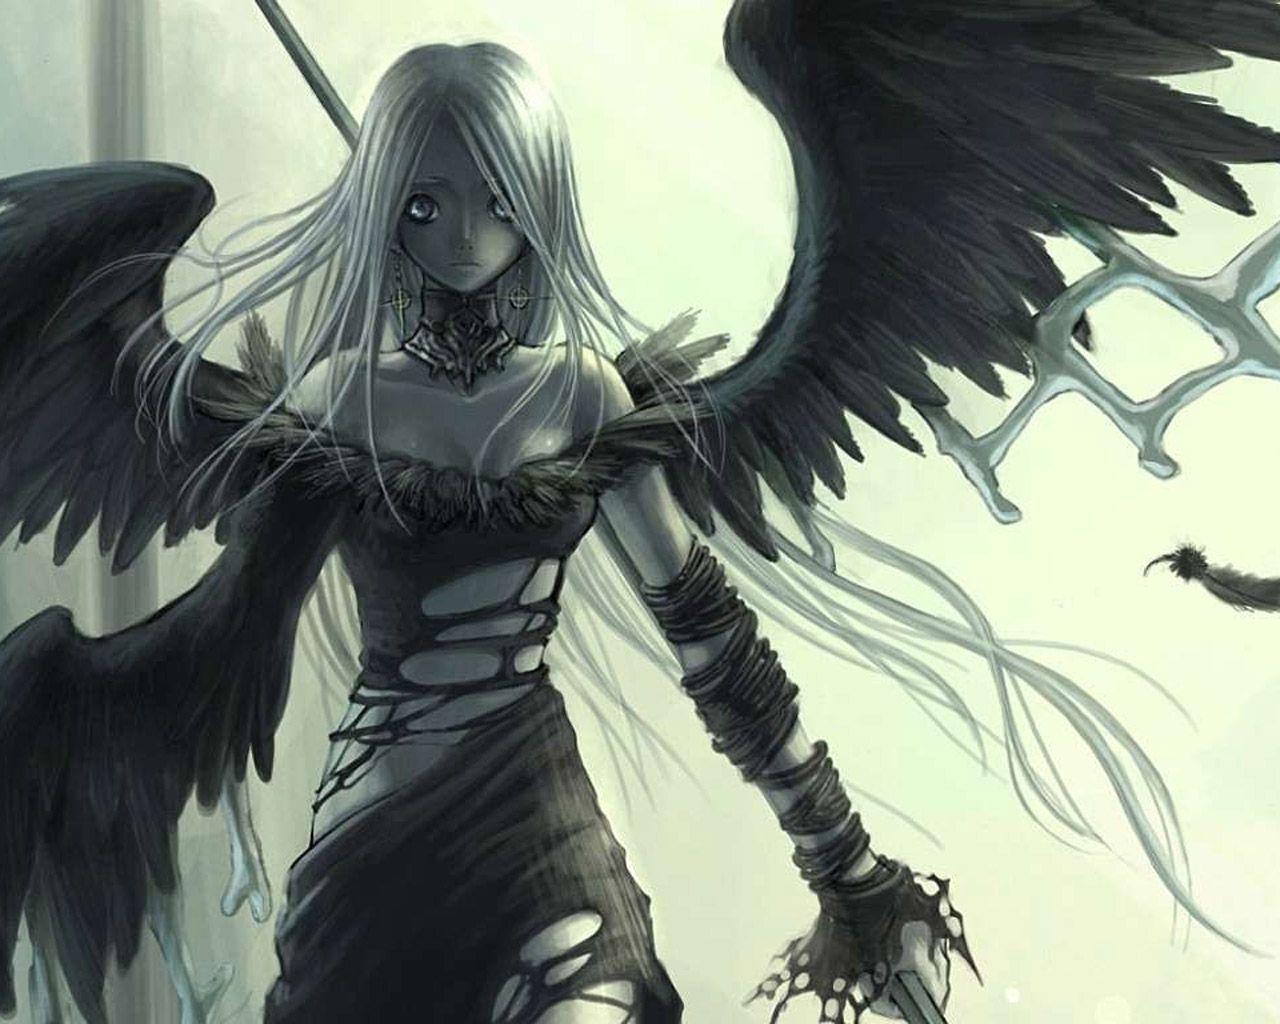 Dark Angels Wallpaper